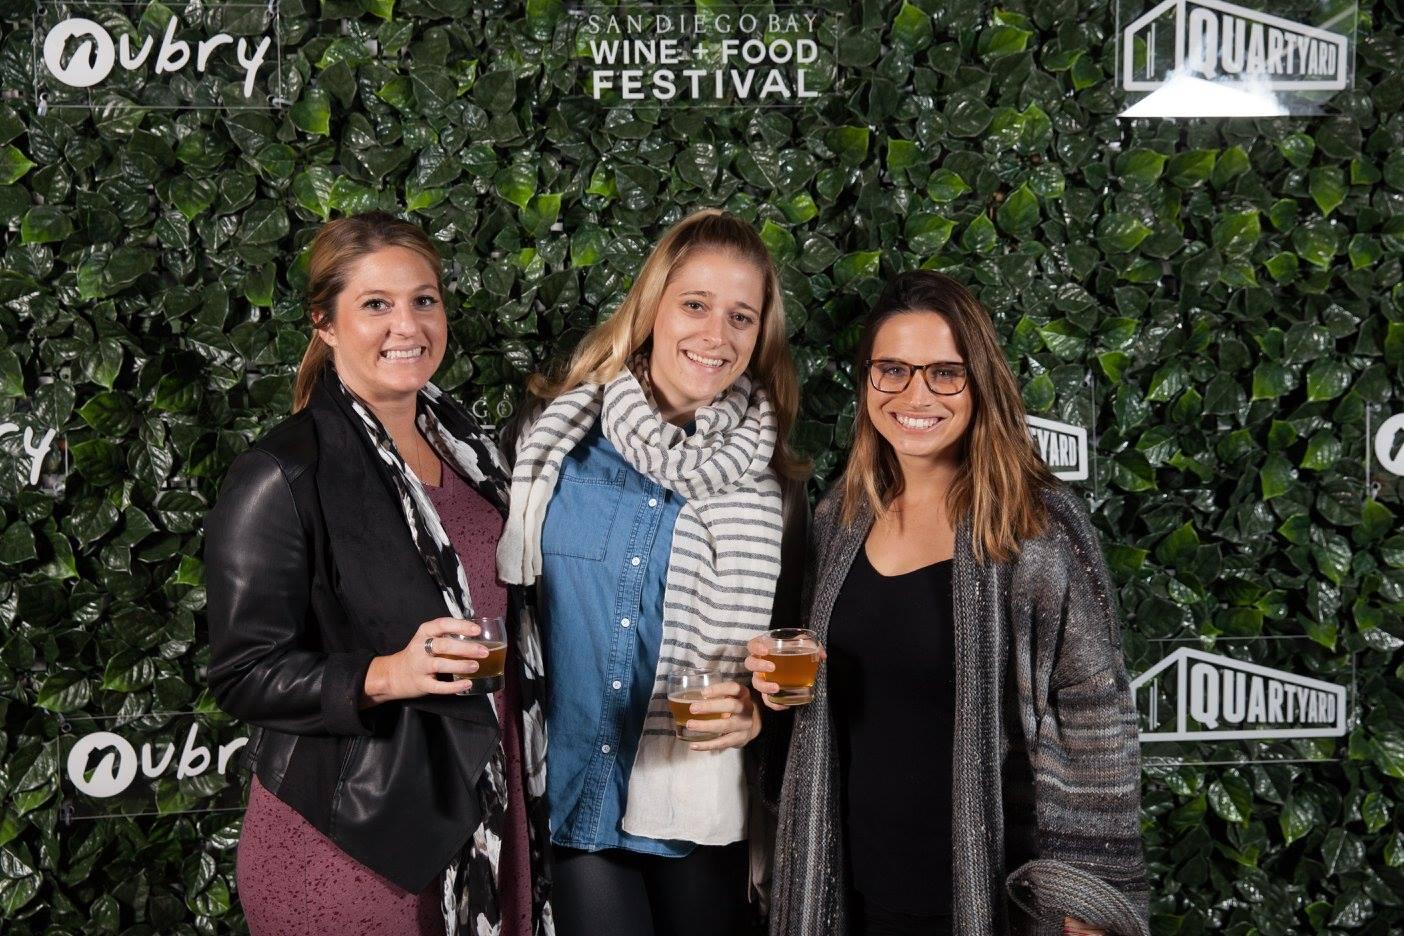 San diego bay wine festival nubry taco tko quartyard2